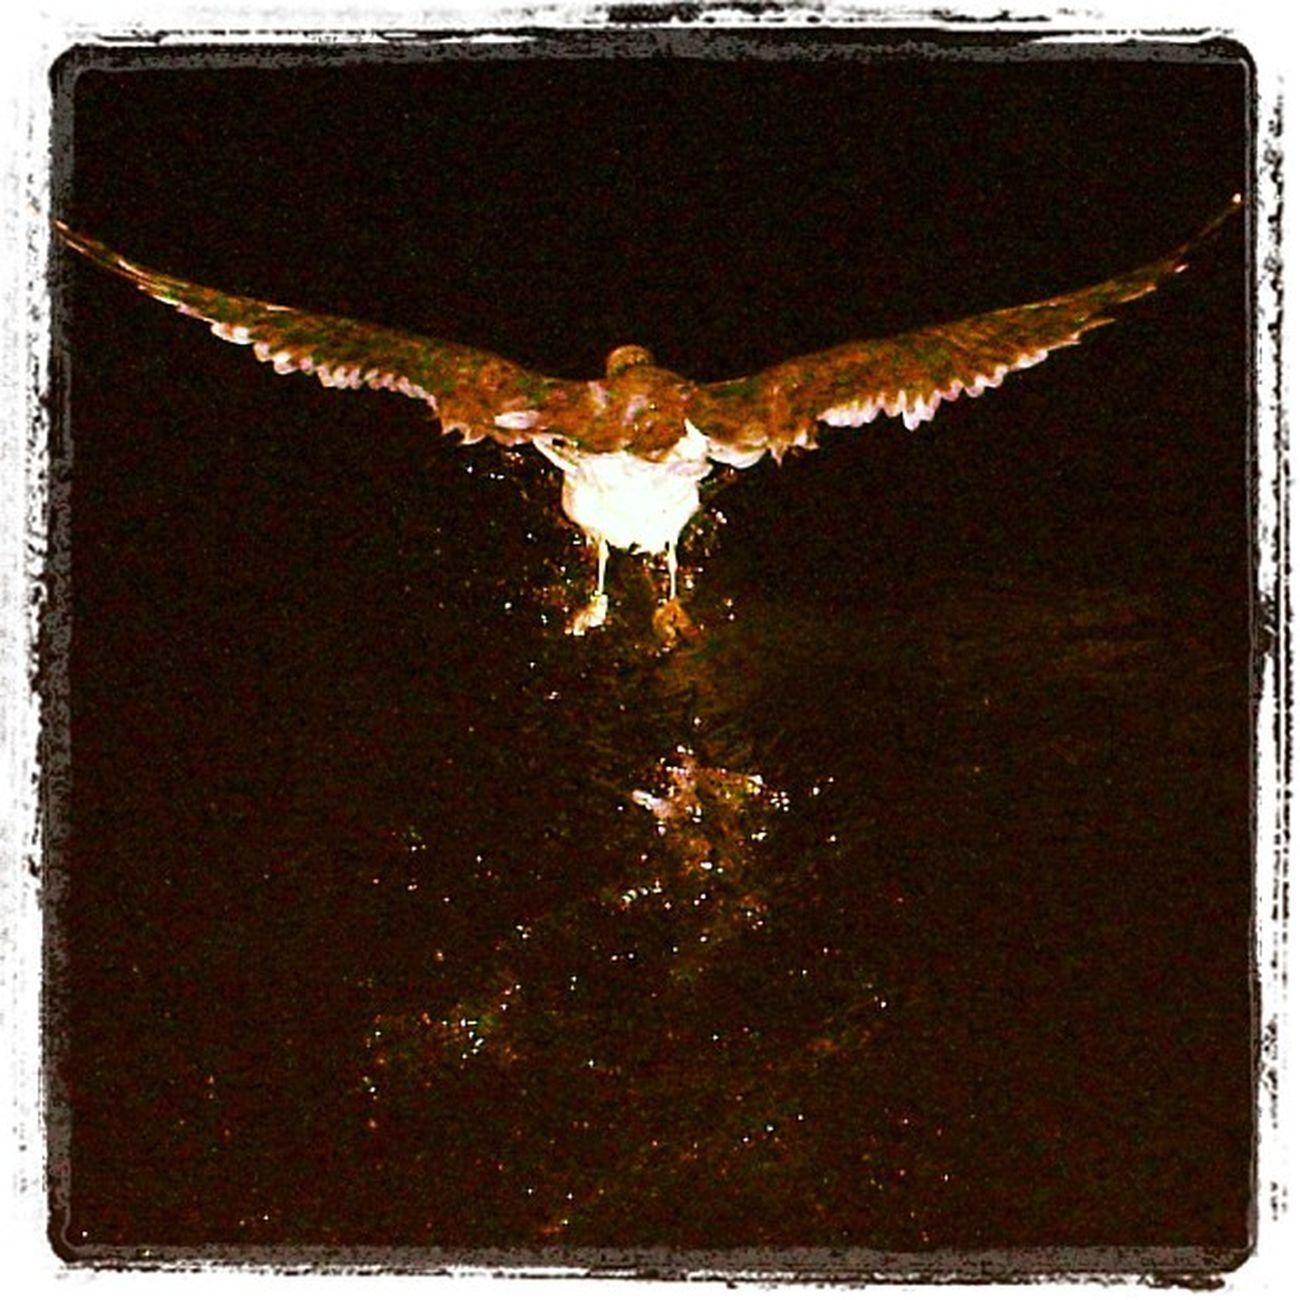 Seagull Ocean Sooke Sookebasin boardwalk 642 bc black night